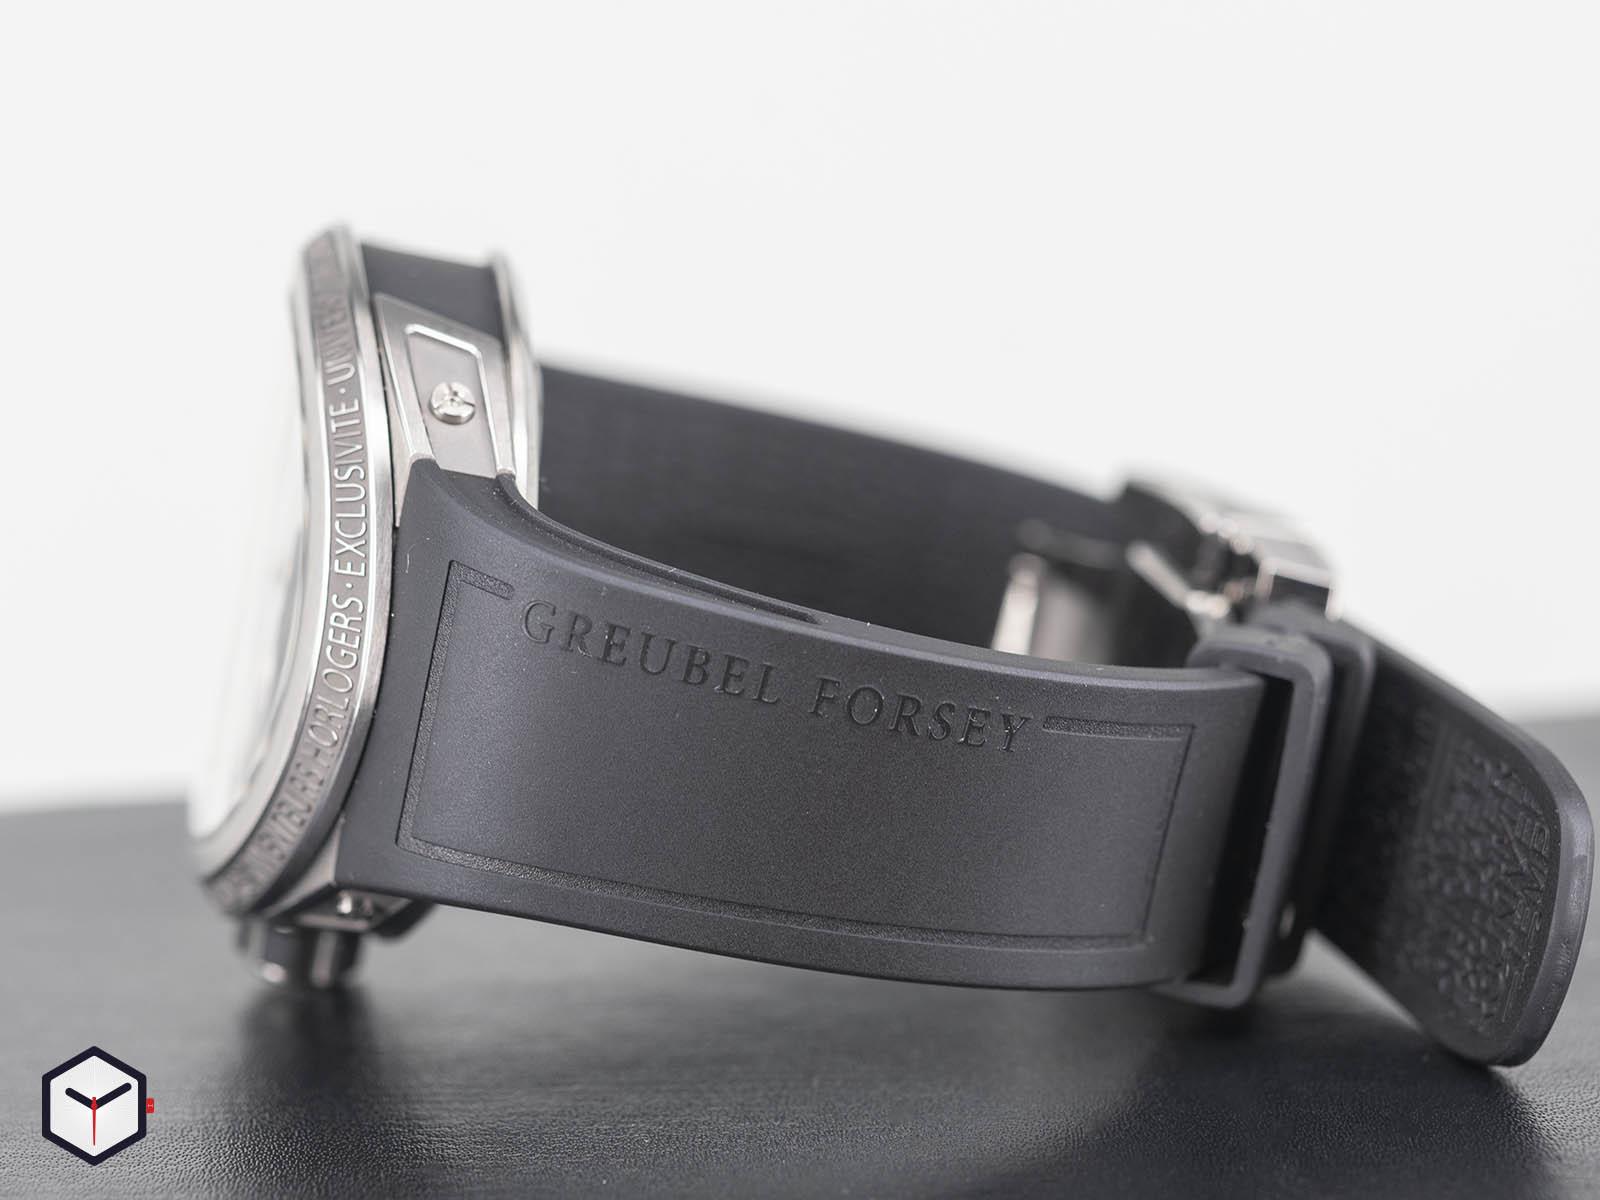 greubel-forsey-balancier-s-10.jpg